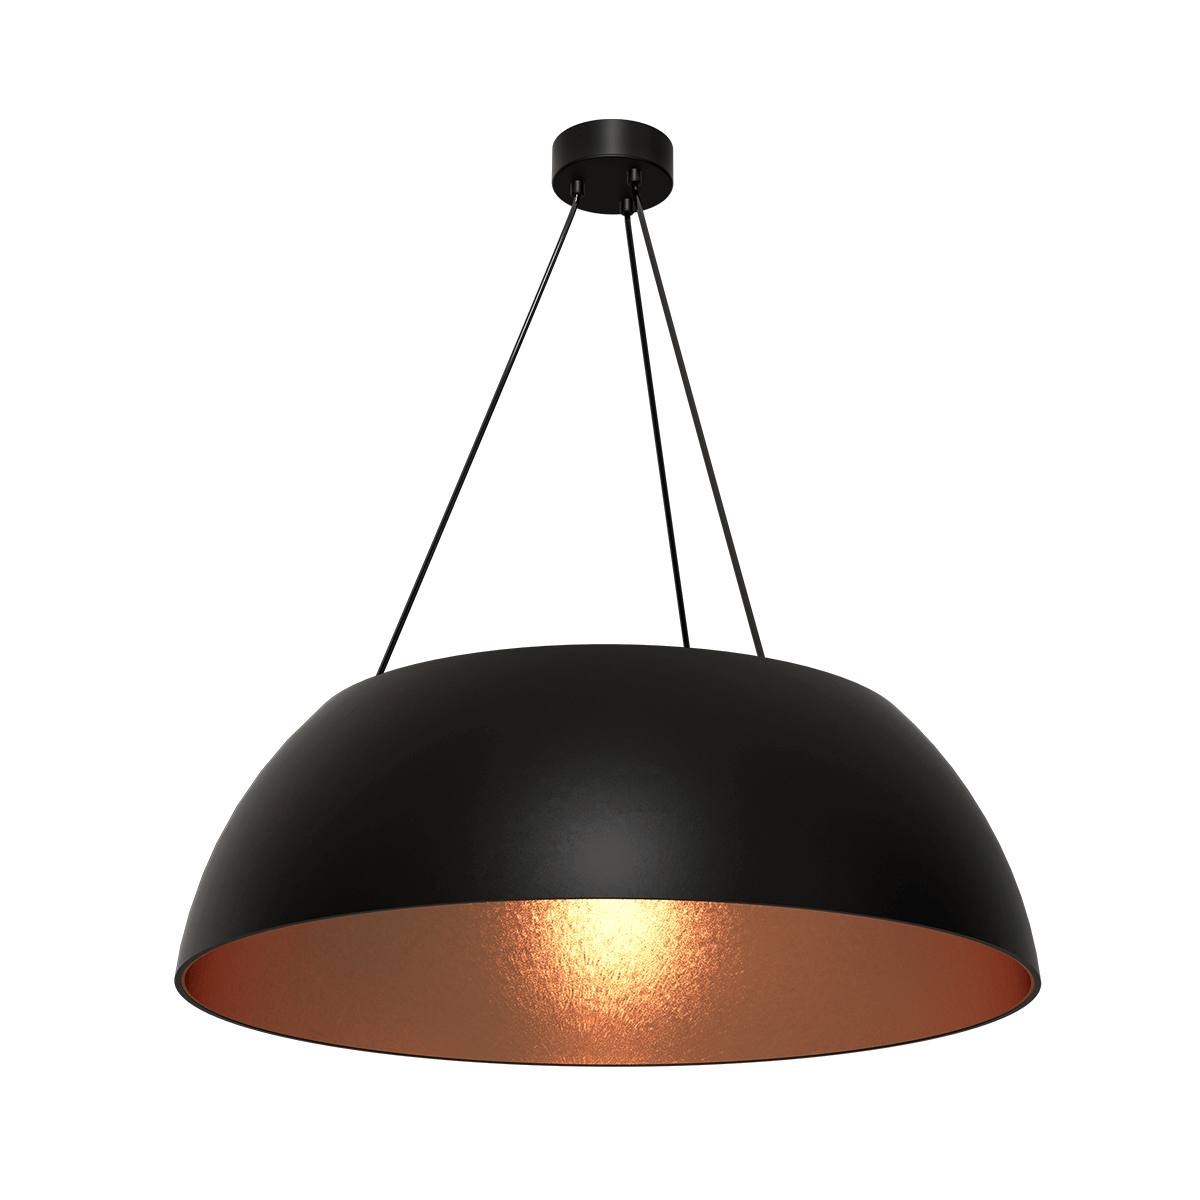 Lampa wisząca Morgan